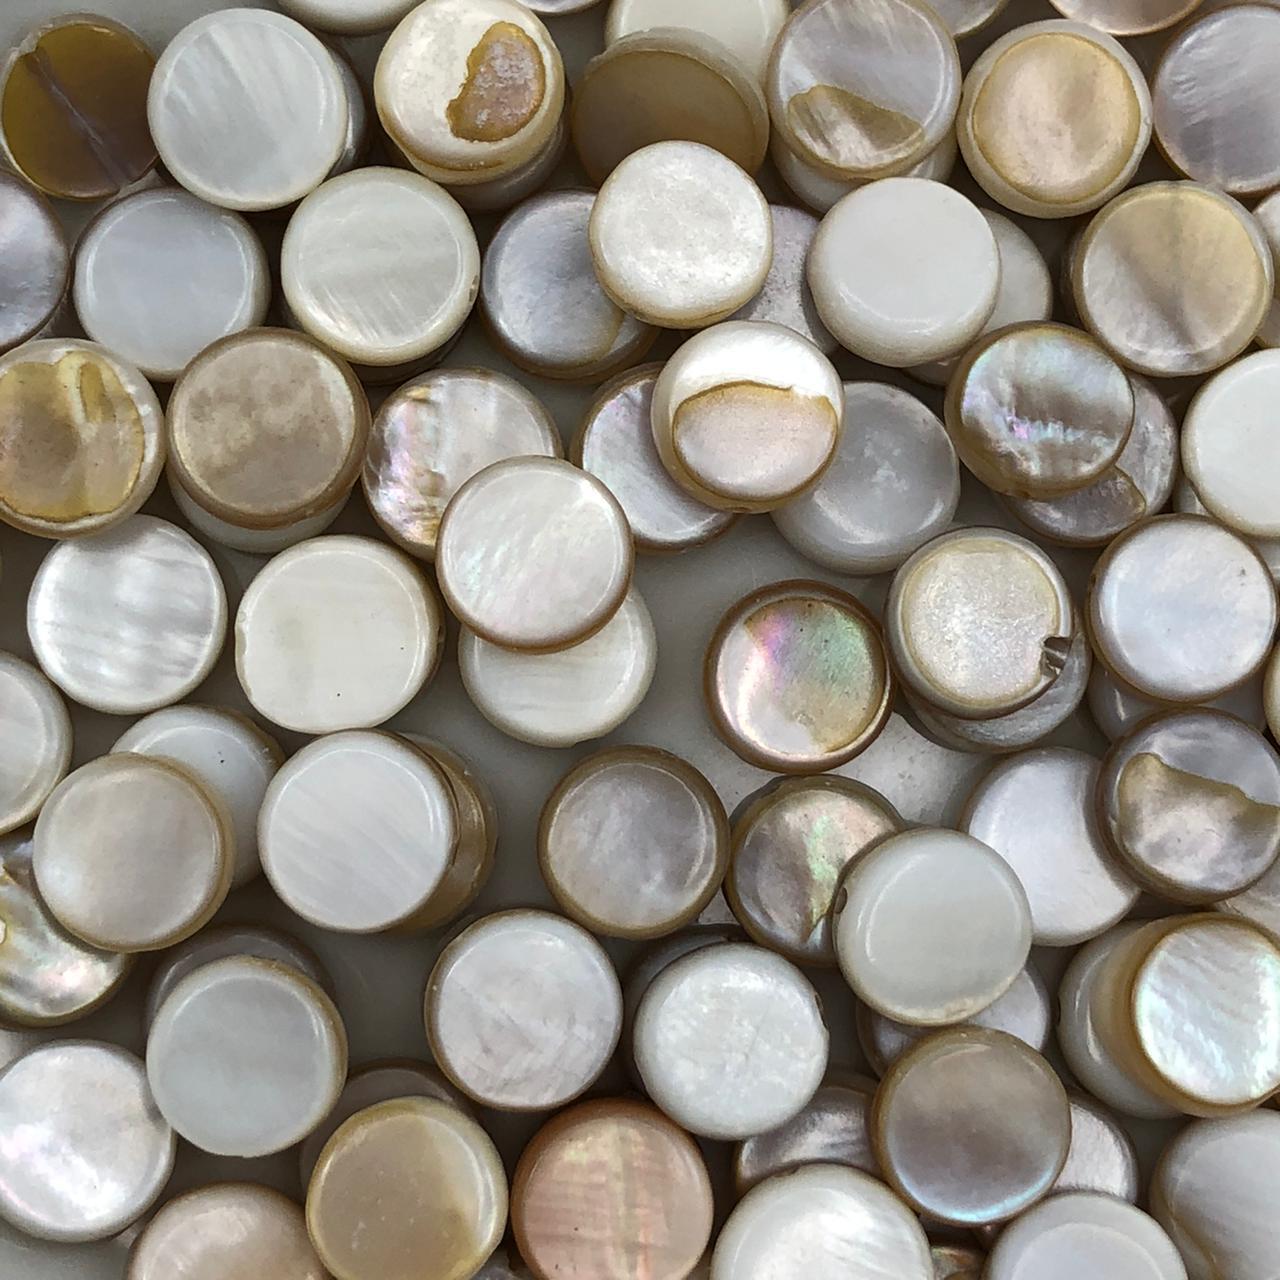 PN137 - Pastilha de Madre Perola Natural 8x7mm Marfim  - 25Unids